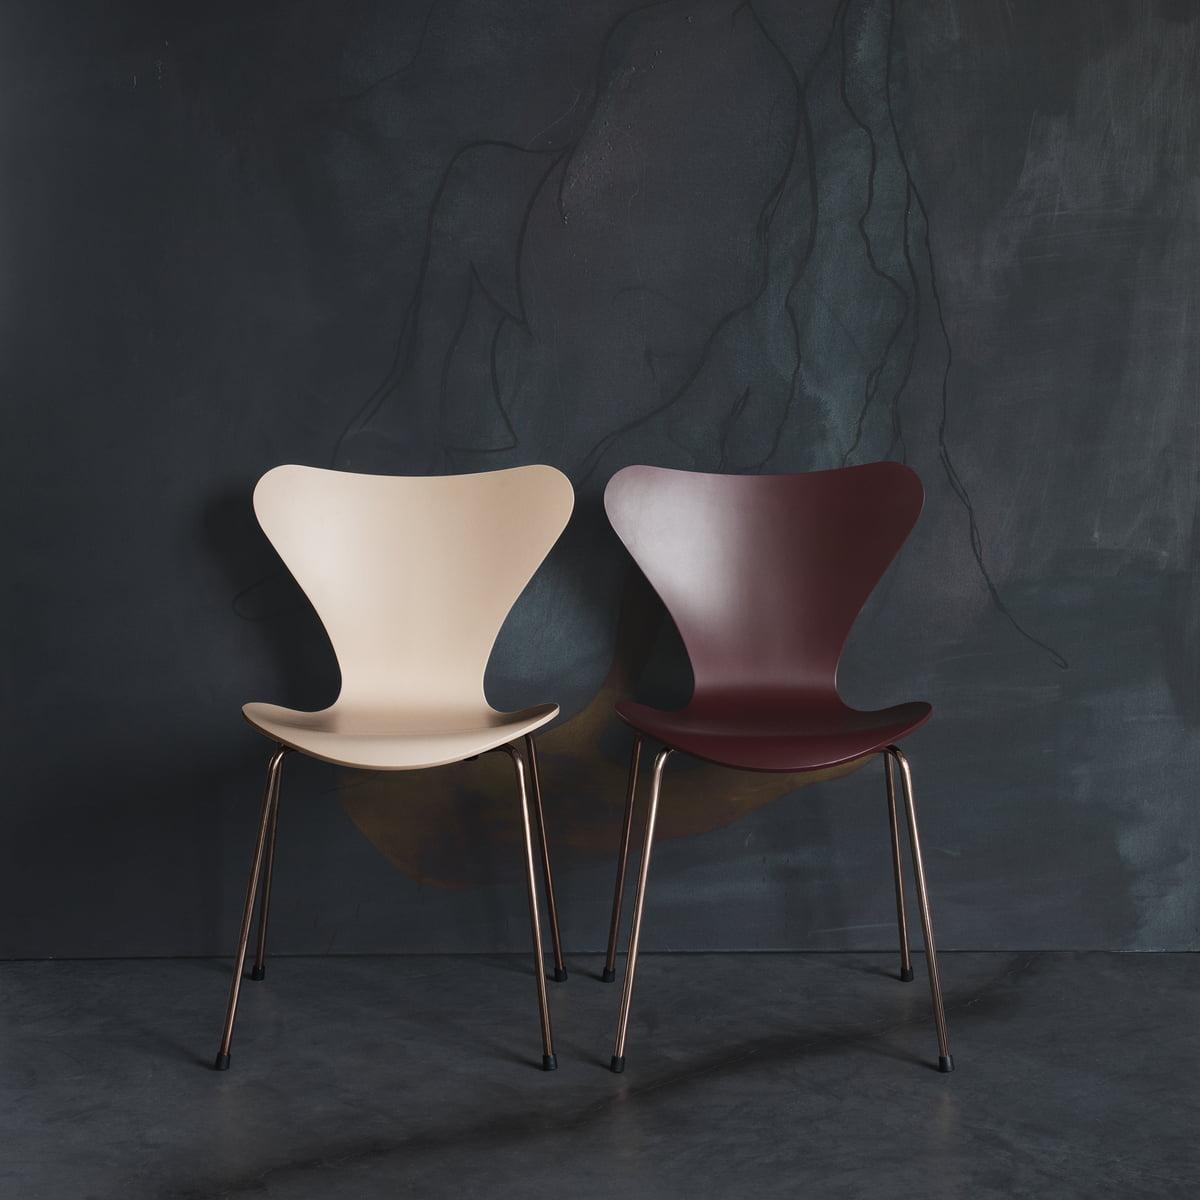 Series 7 Chair Anniversary Edition 2017